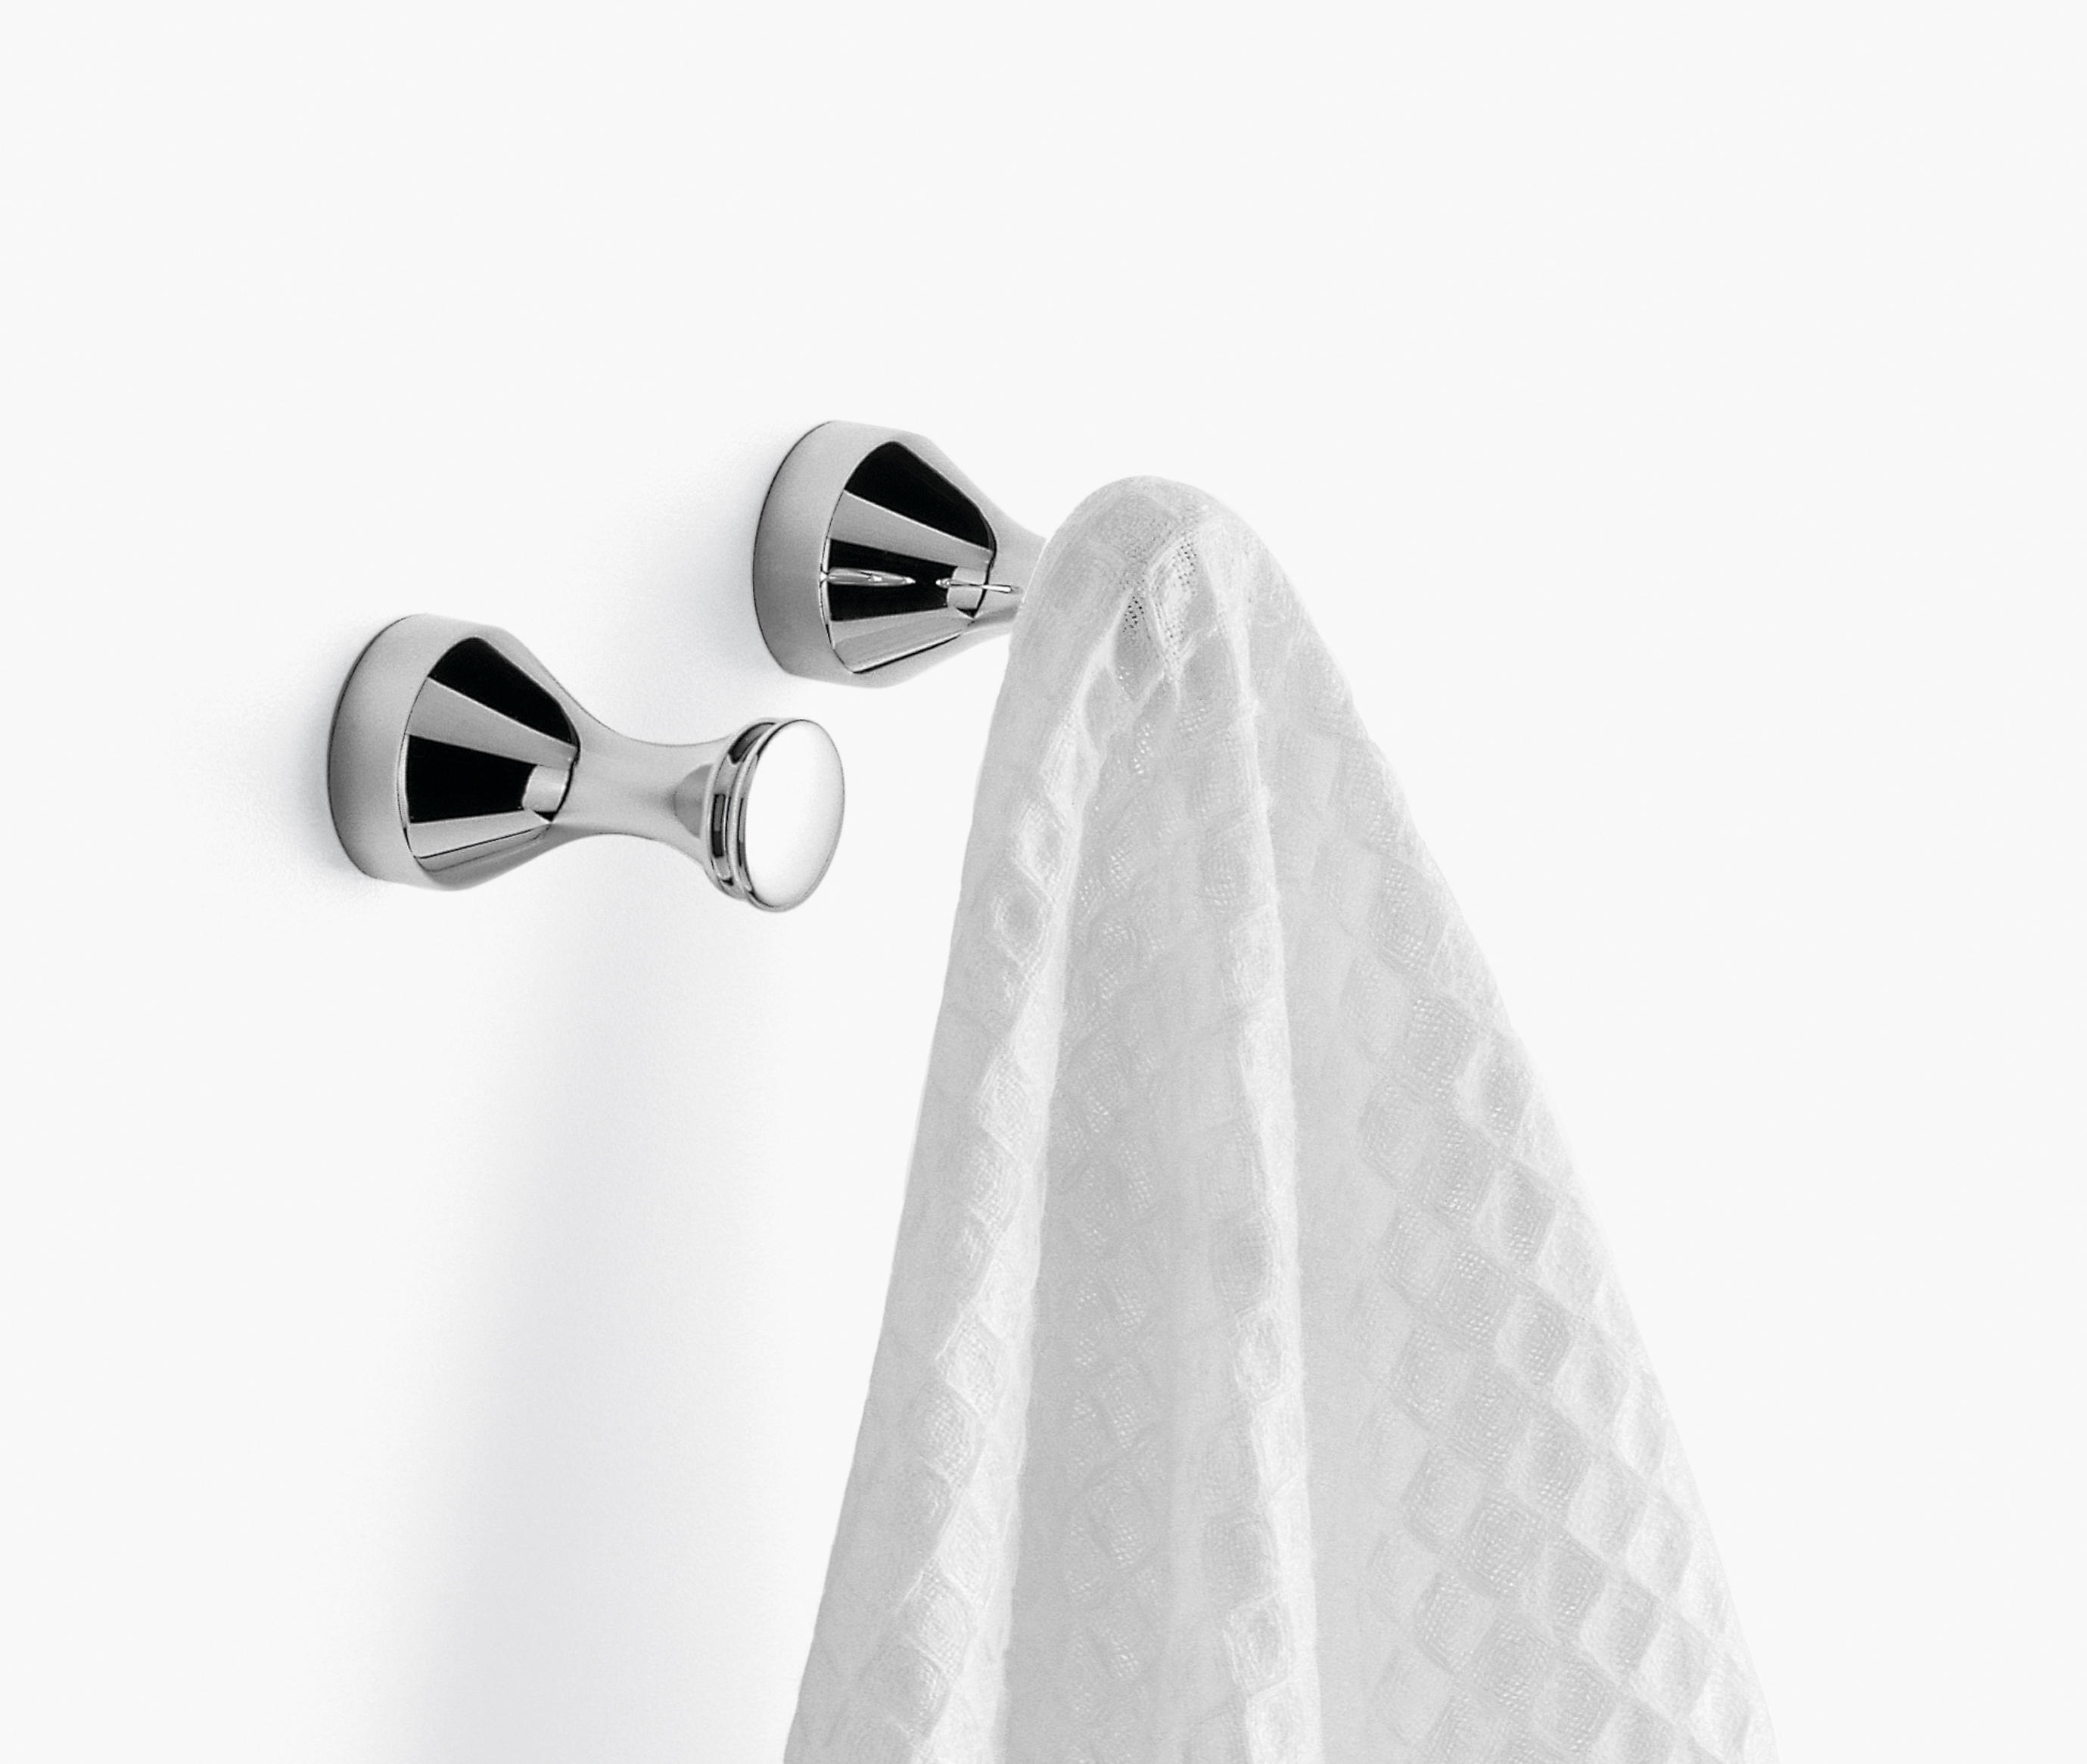 madison ganchos ganchos colgadores de dornbracht architonic. Black Bedroom Furniture Sets. Home Design Ideas